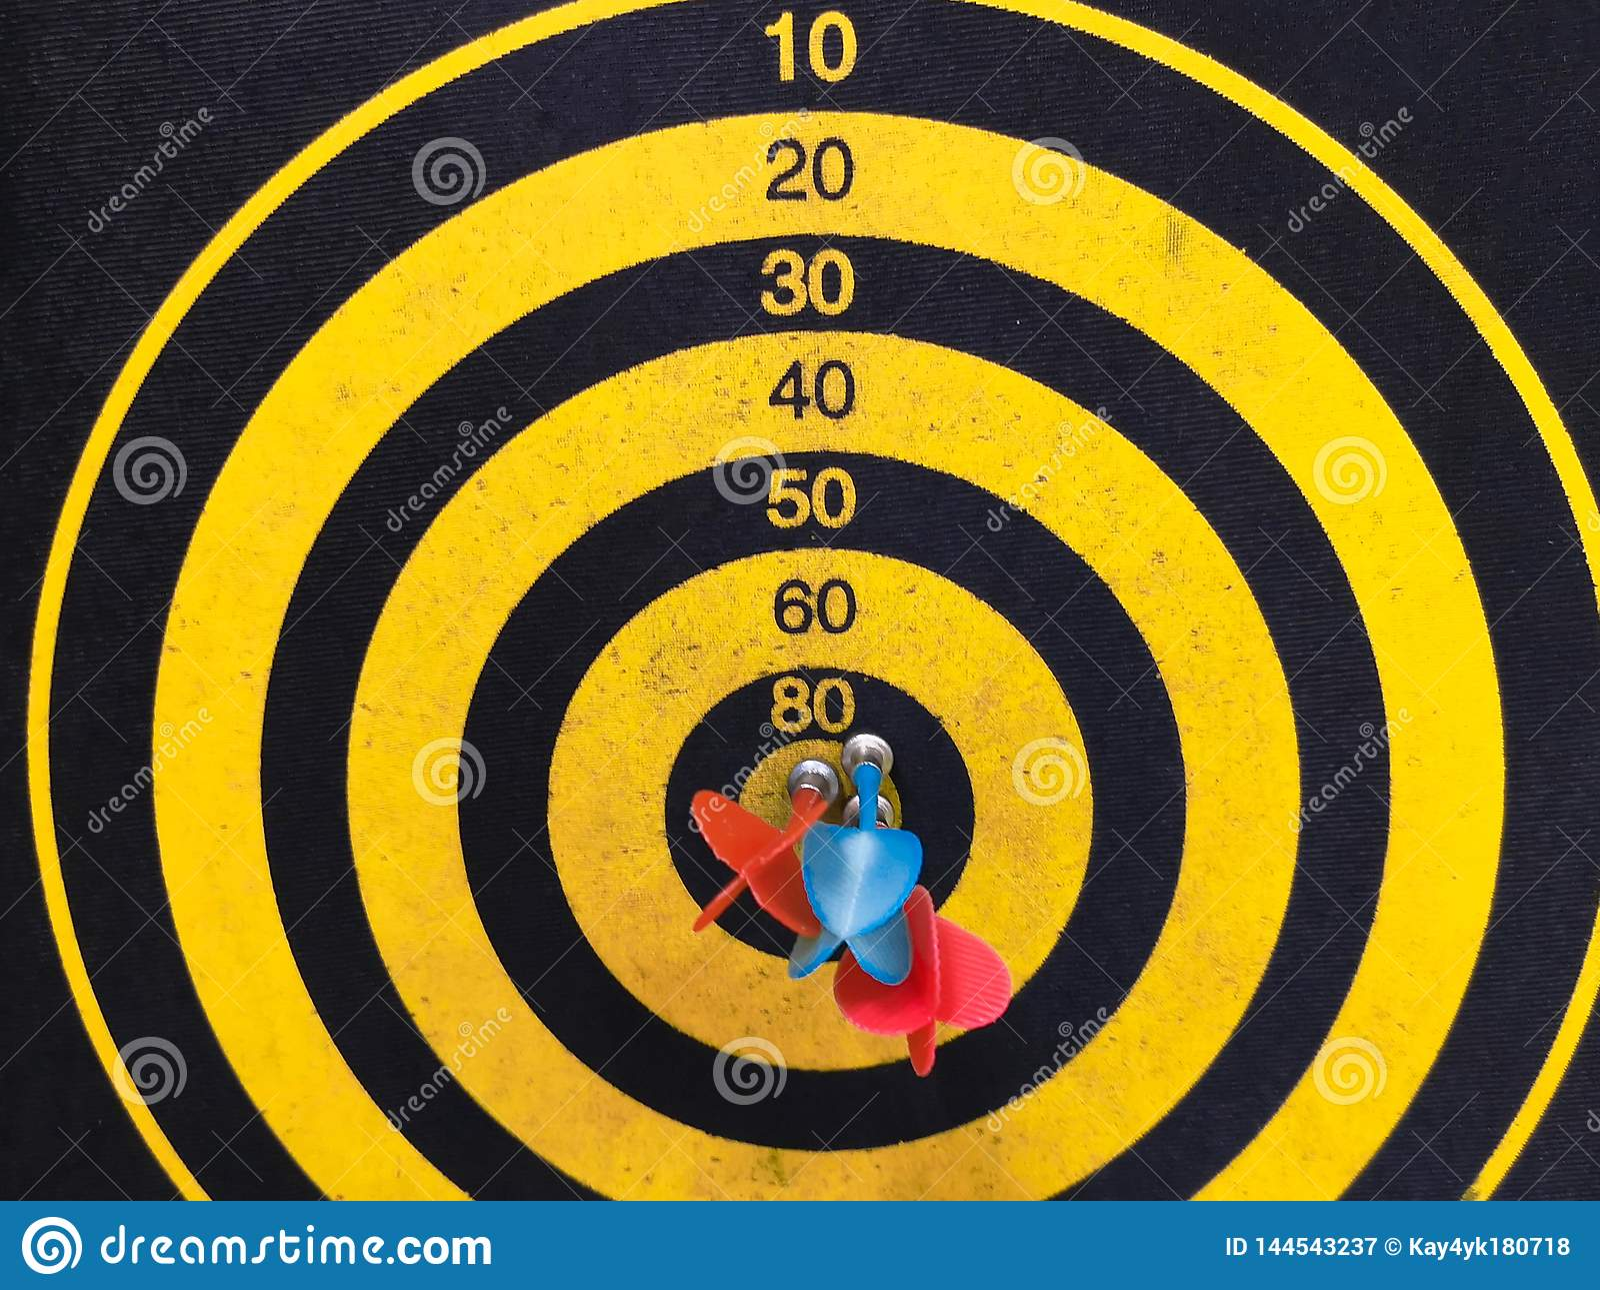 Close Up Shot Of A Dart Board  Darts Arrow Missing The